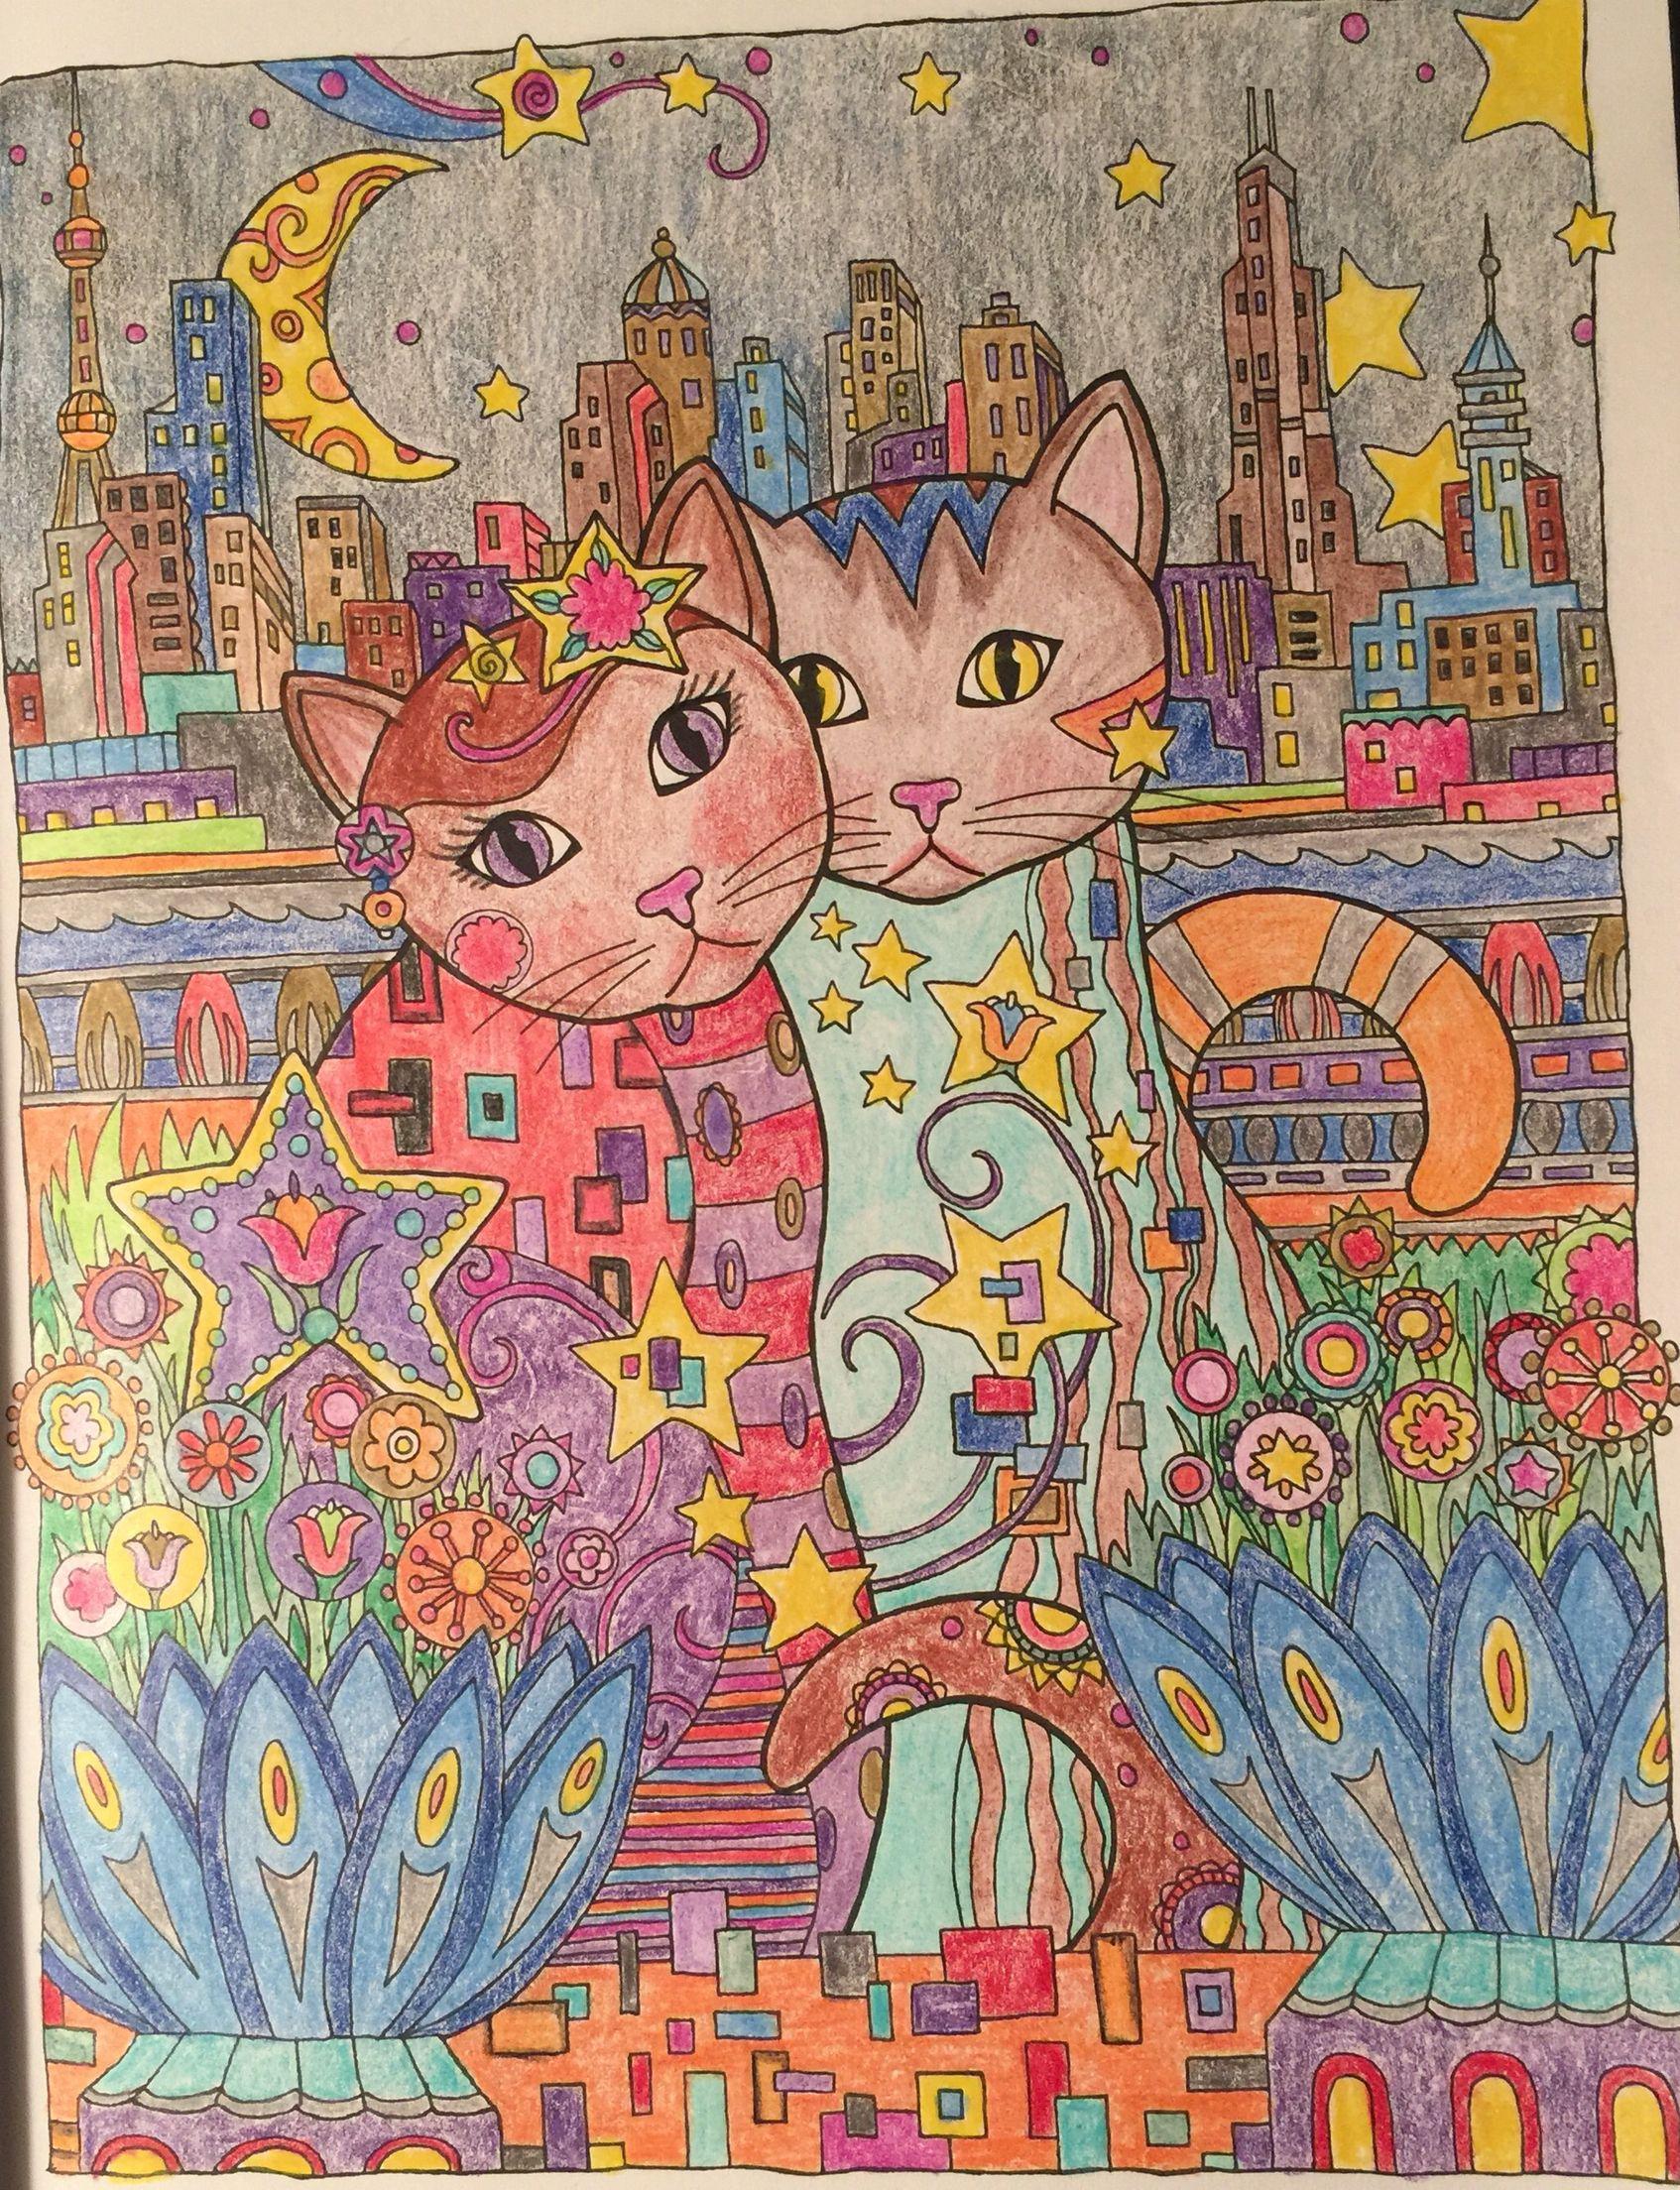 Zen cat coloring page - Creative Cats By Marjorie Sarnat